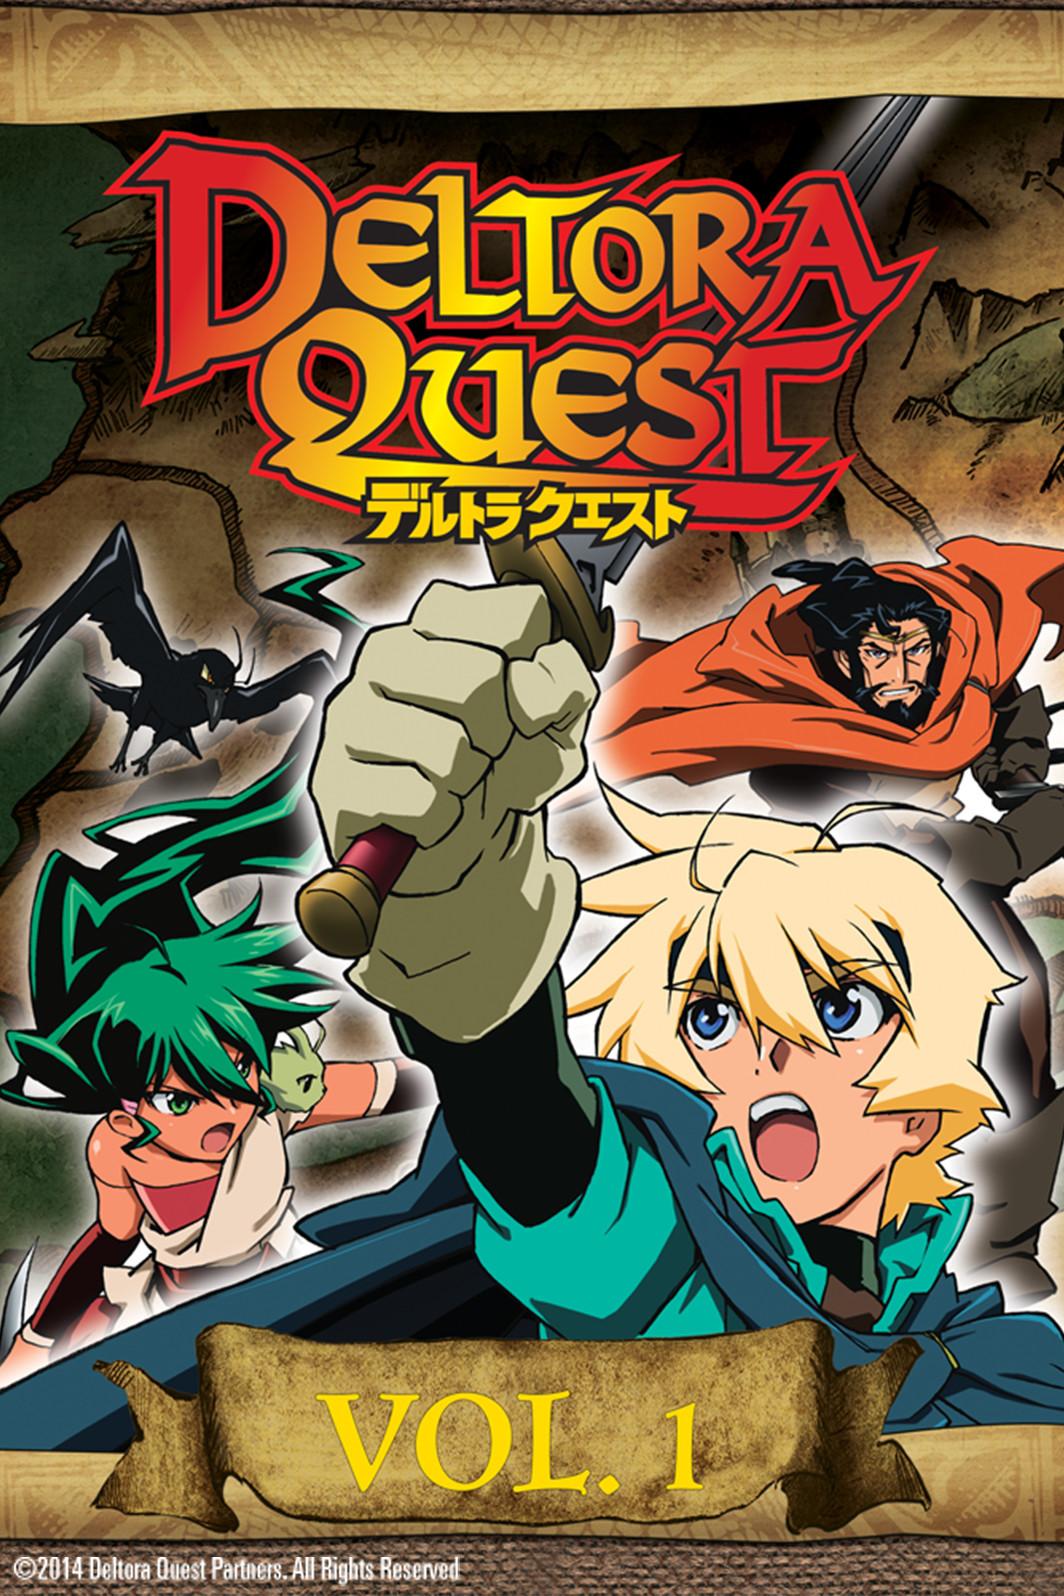 Deltora Quest - Watch on Crunchyroll